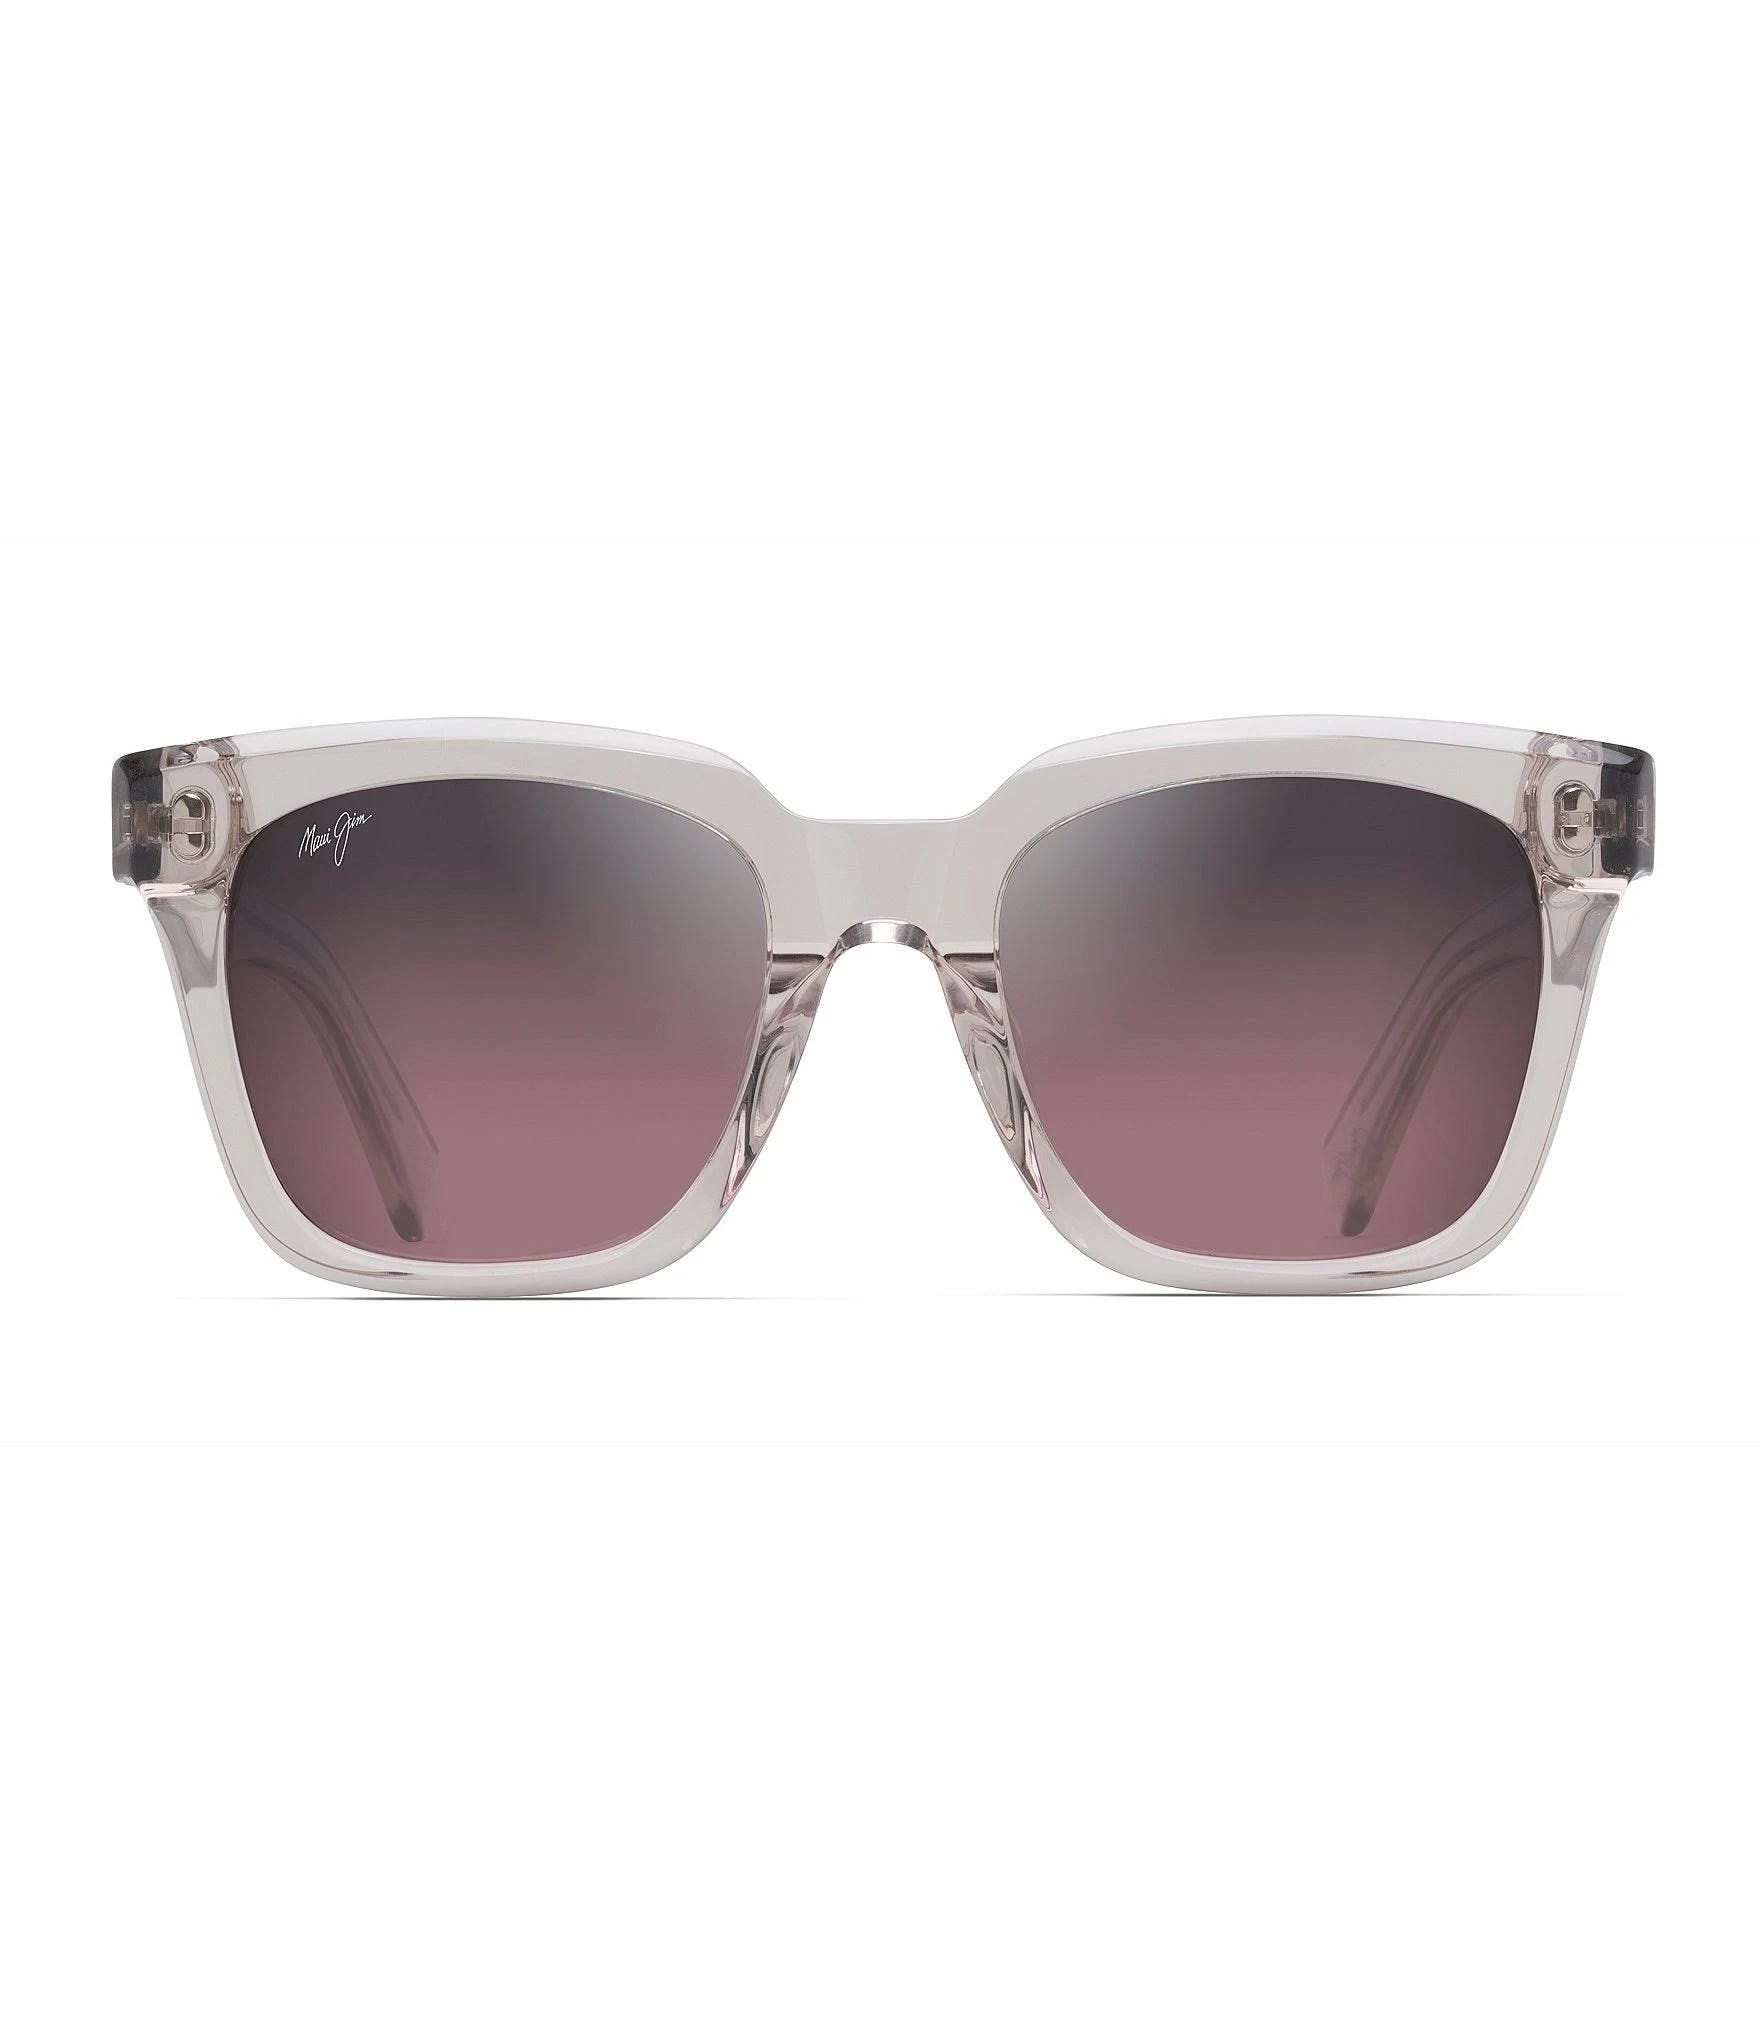 Maui Jim Heliconia - Pink - Sunglasses